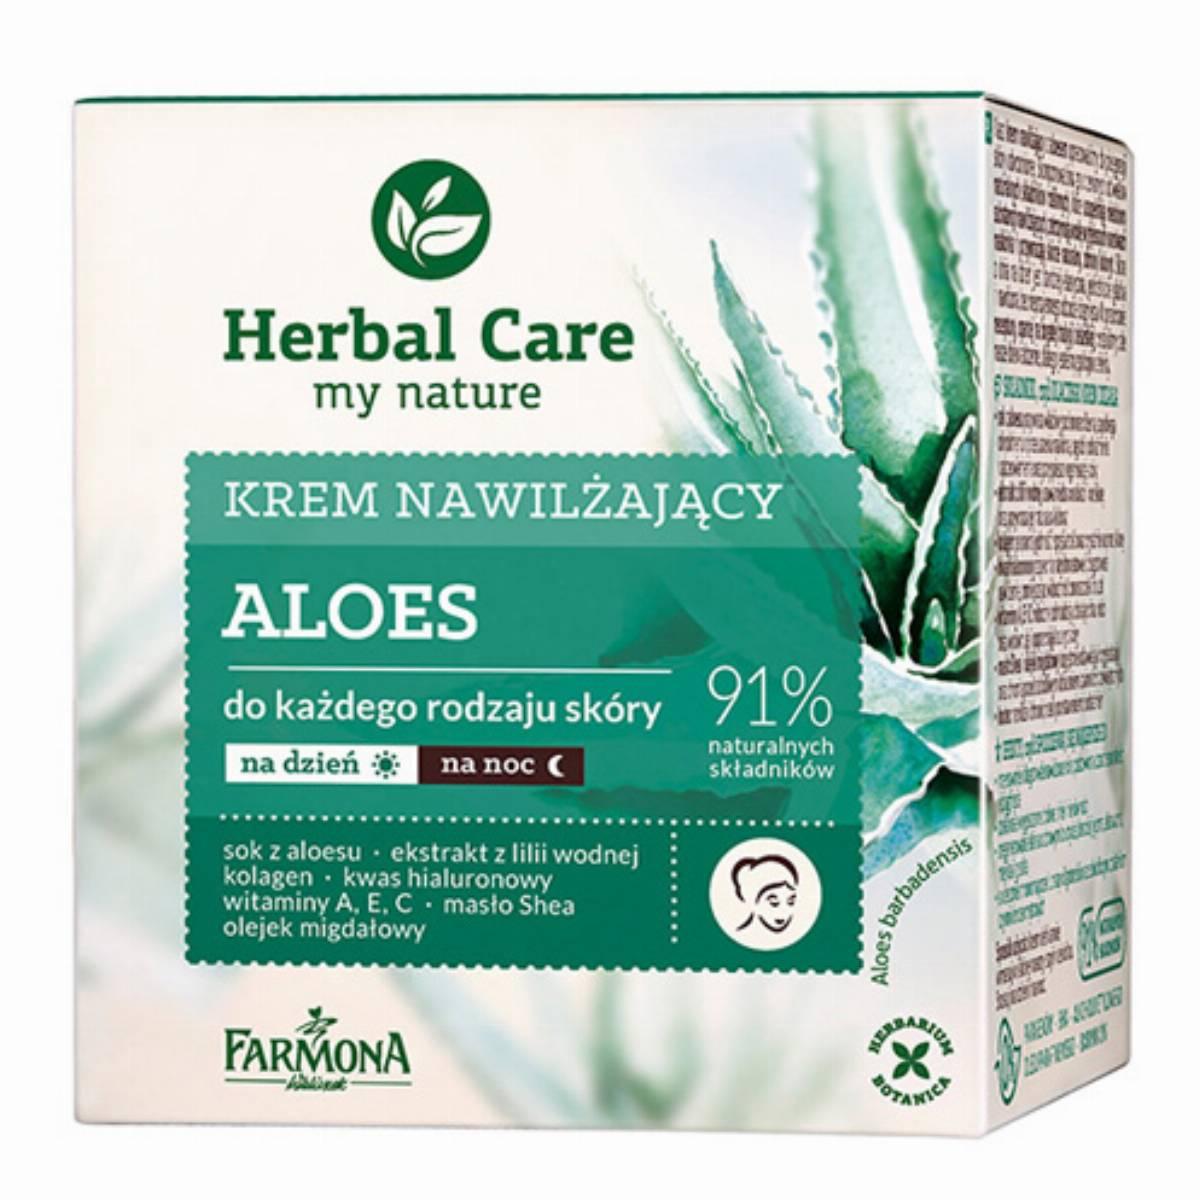 Farmona Herbal Care krem do twarzy - aloes box